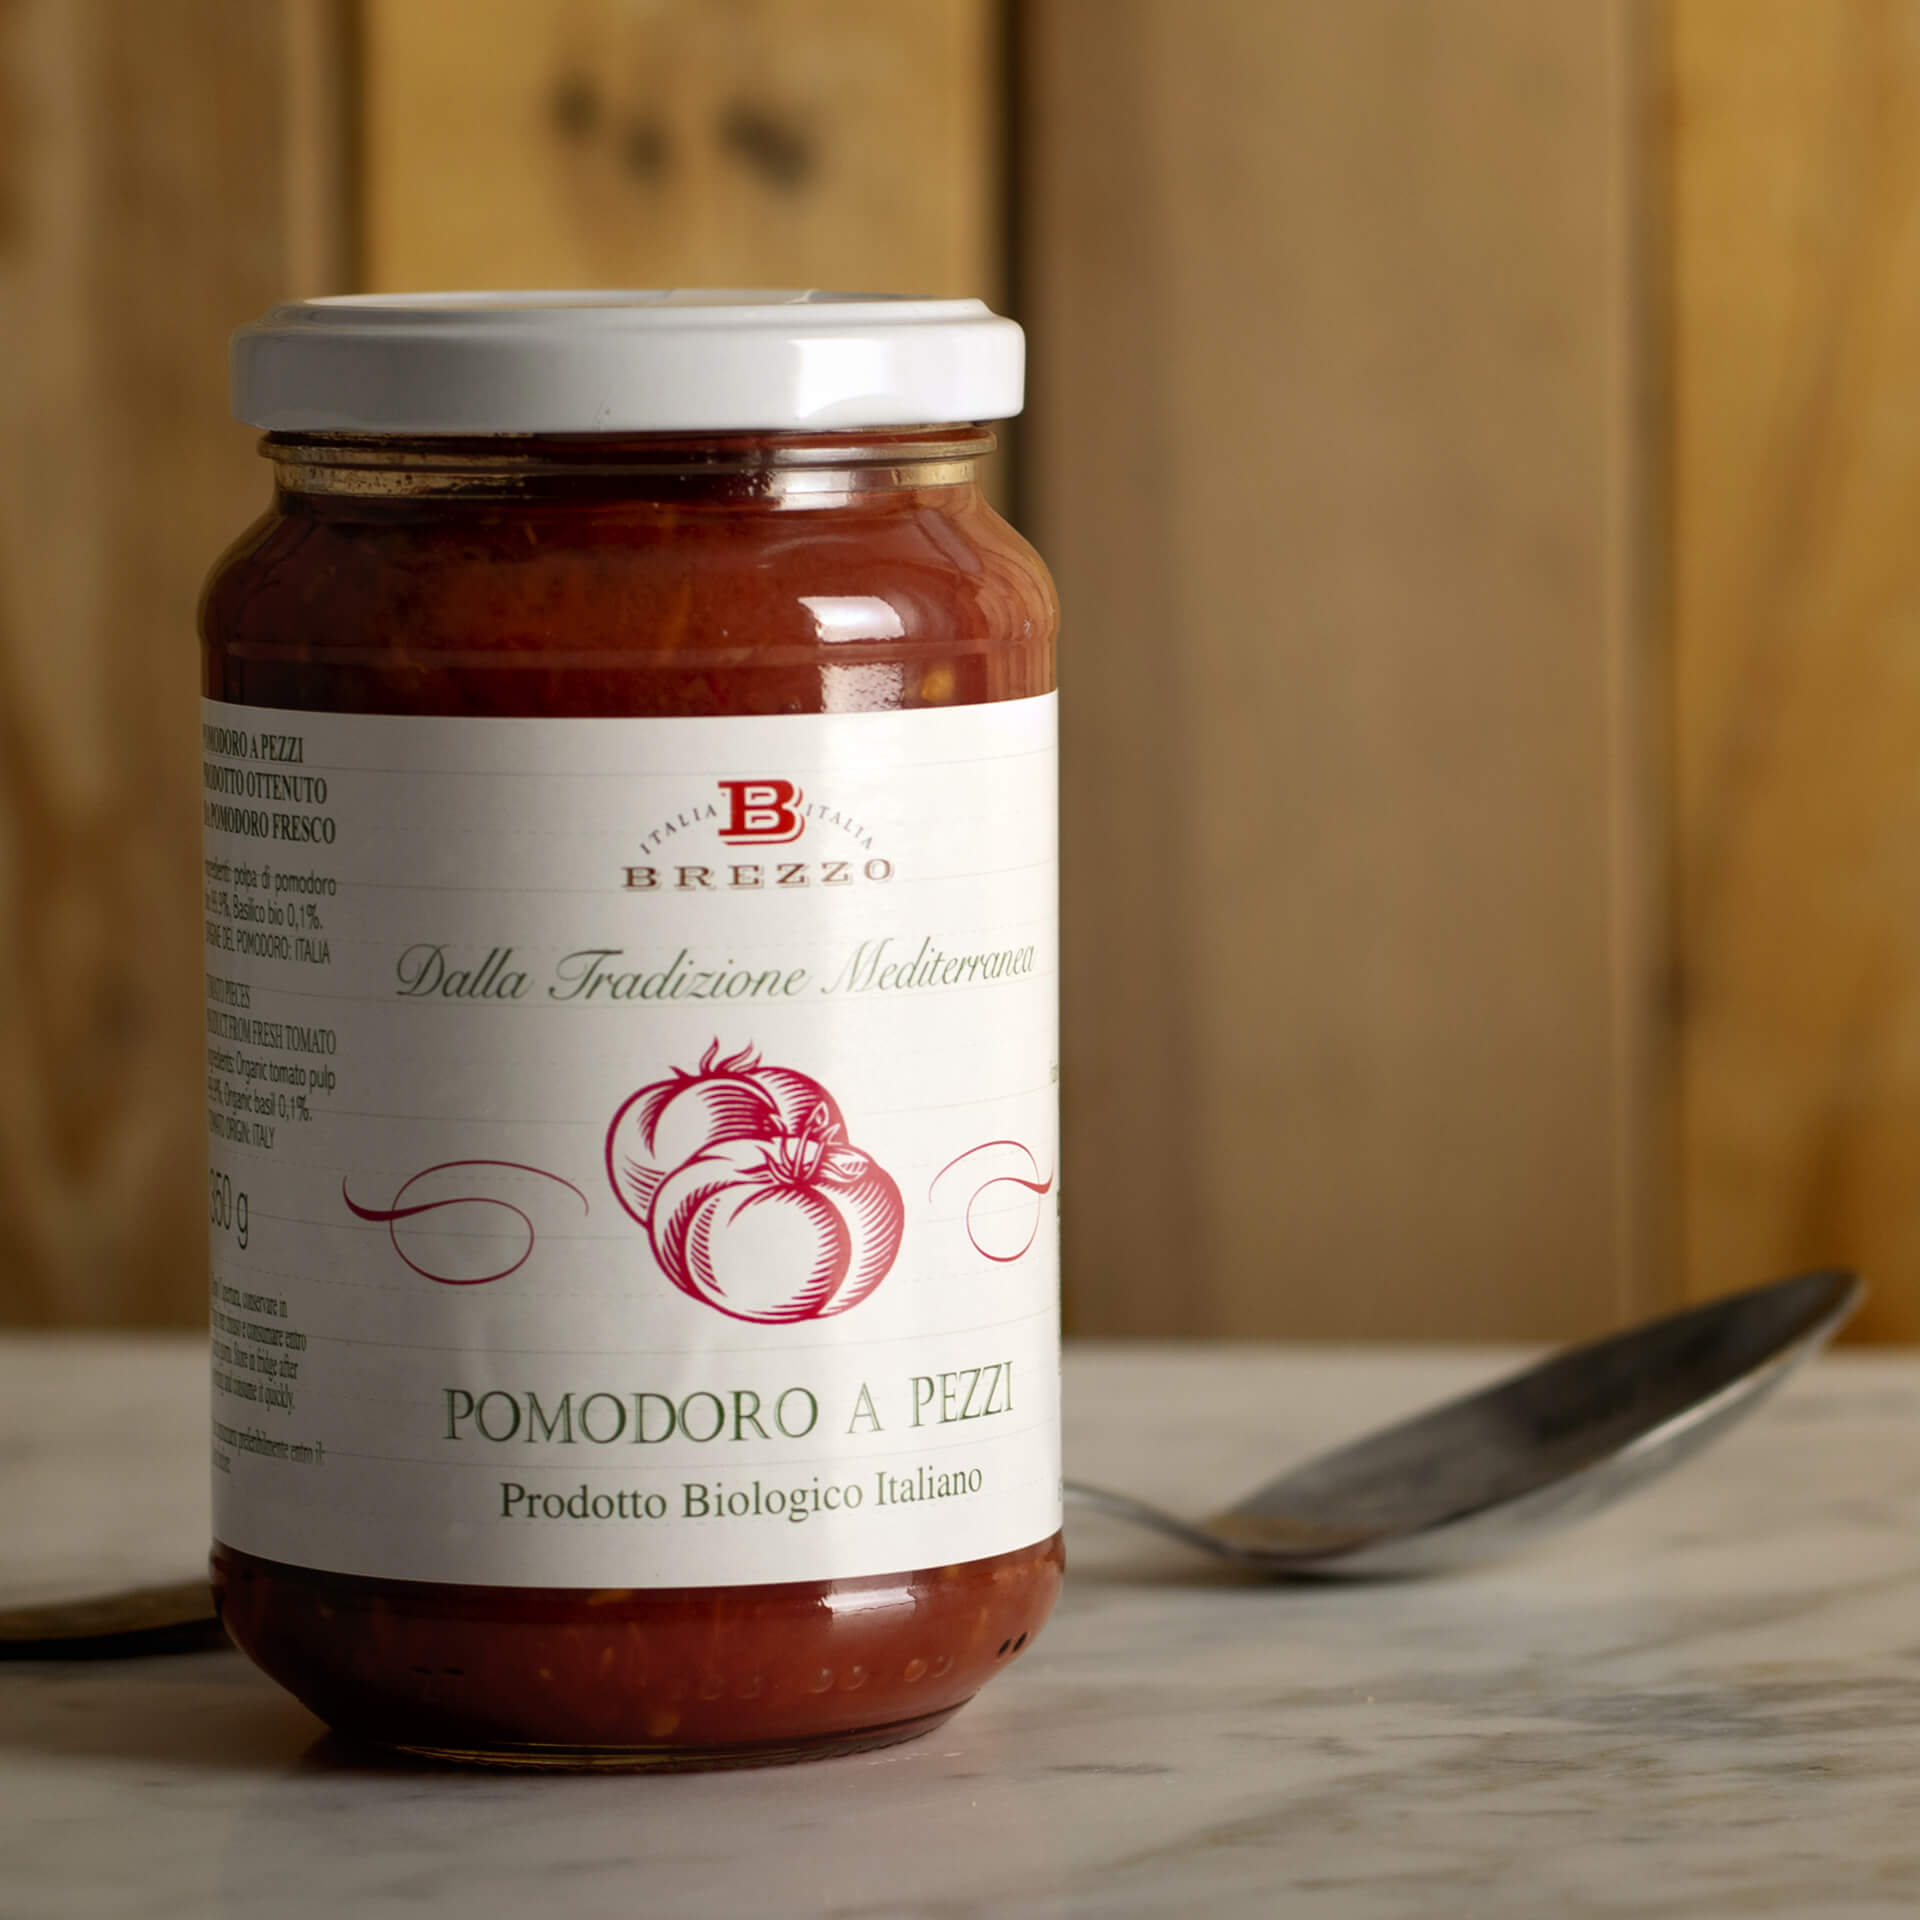 Biological Tomato Sauce